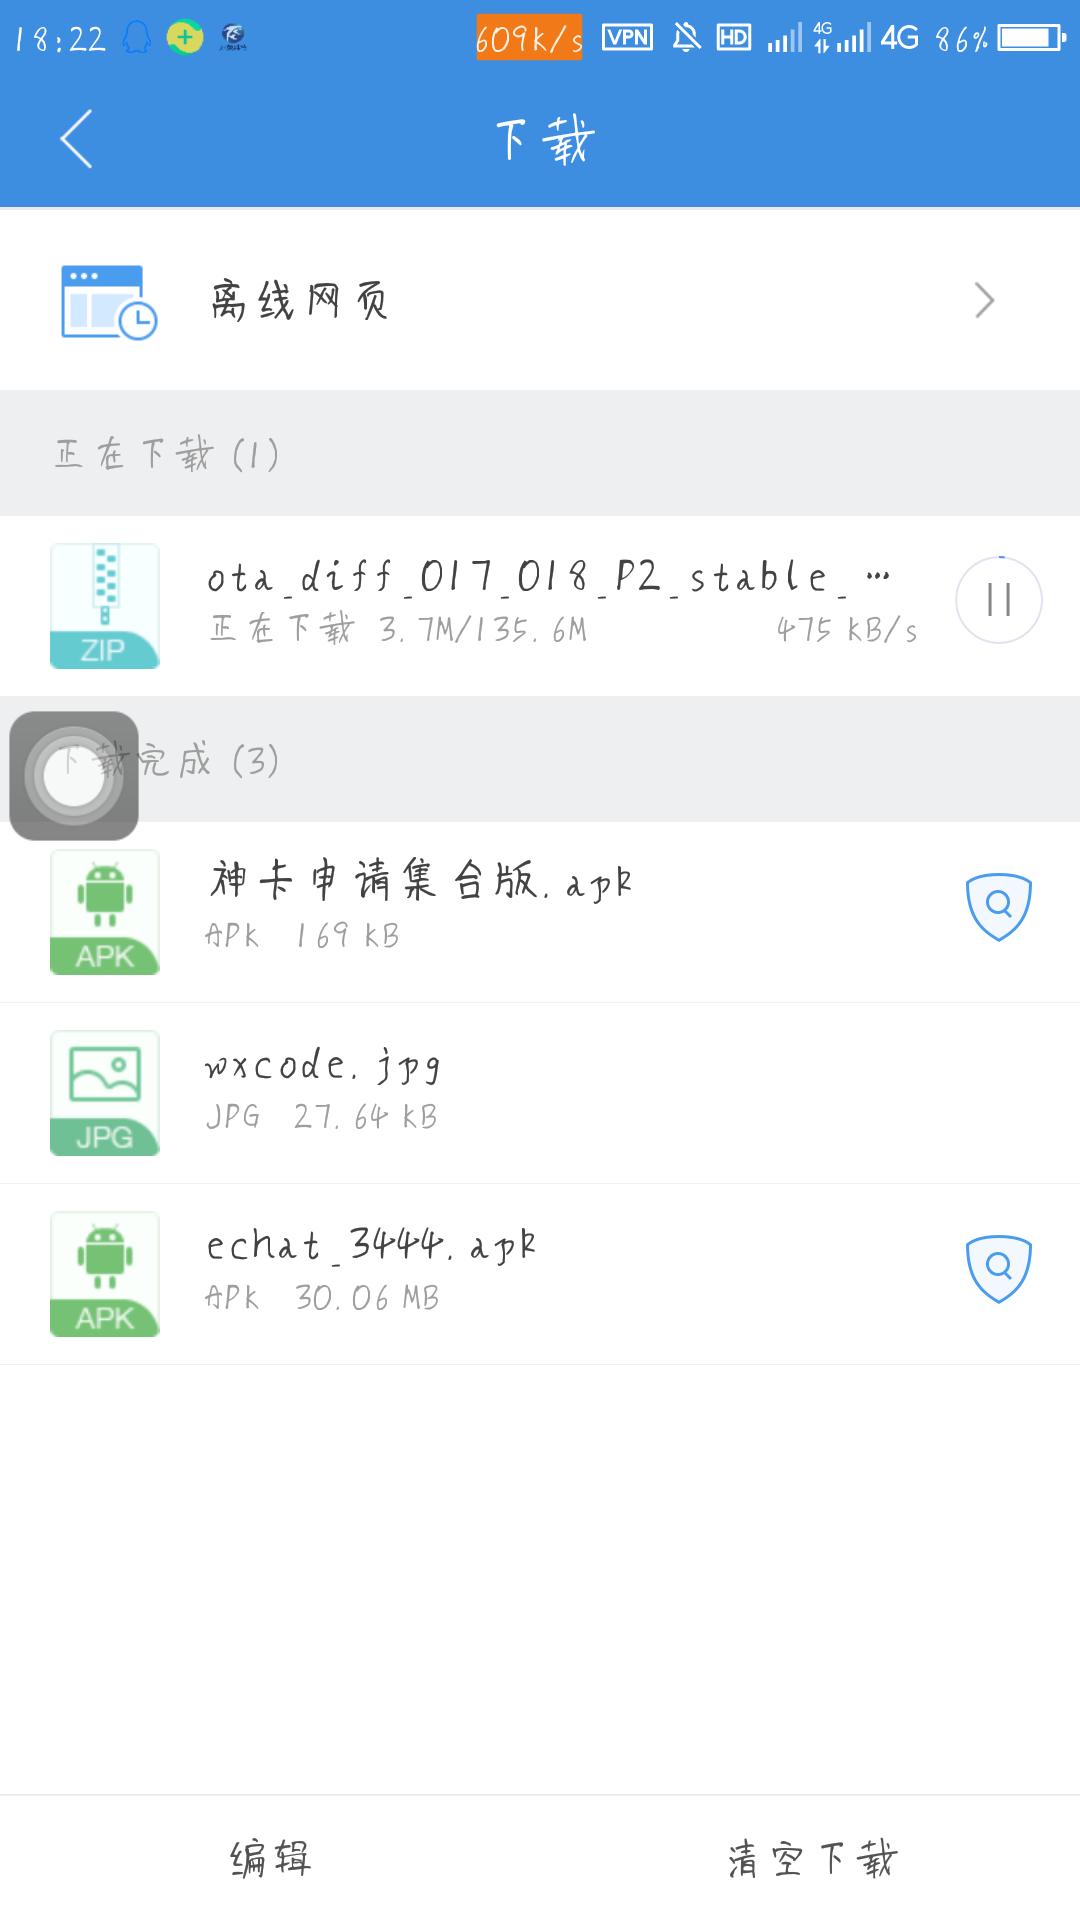 Screenshot_2017-01-23-18-22-16.png